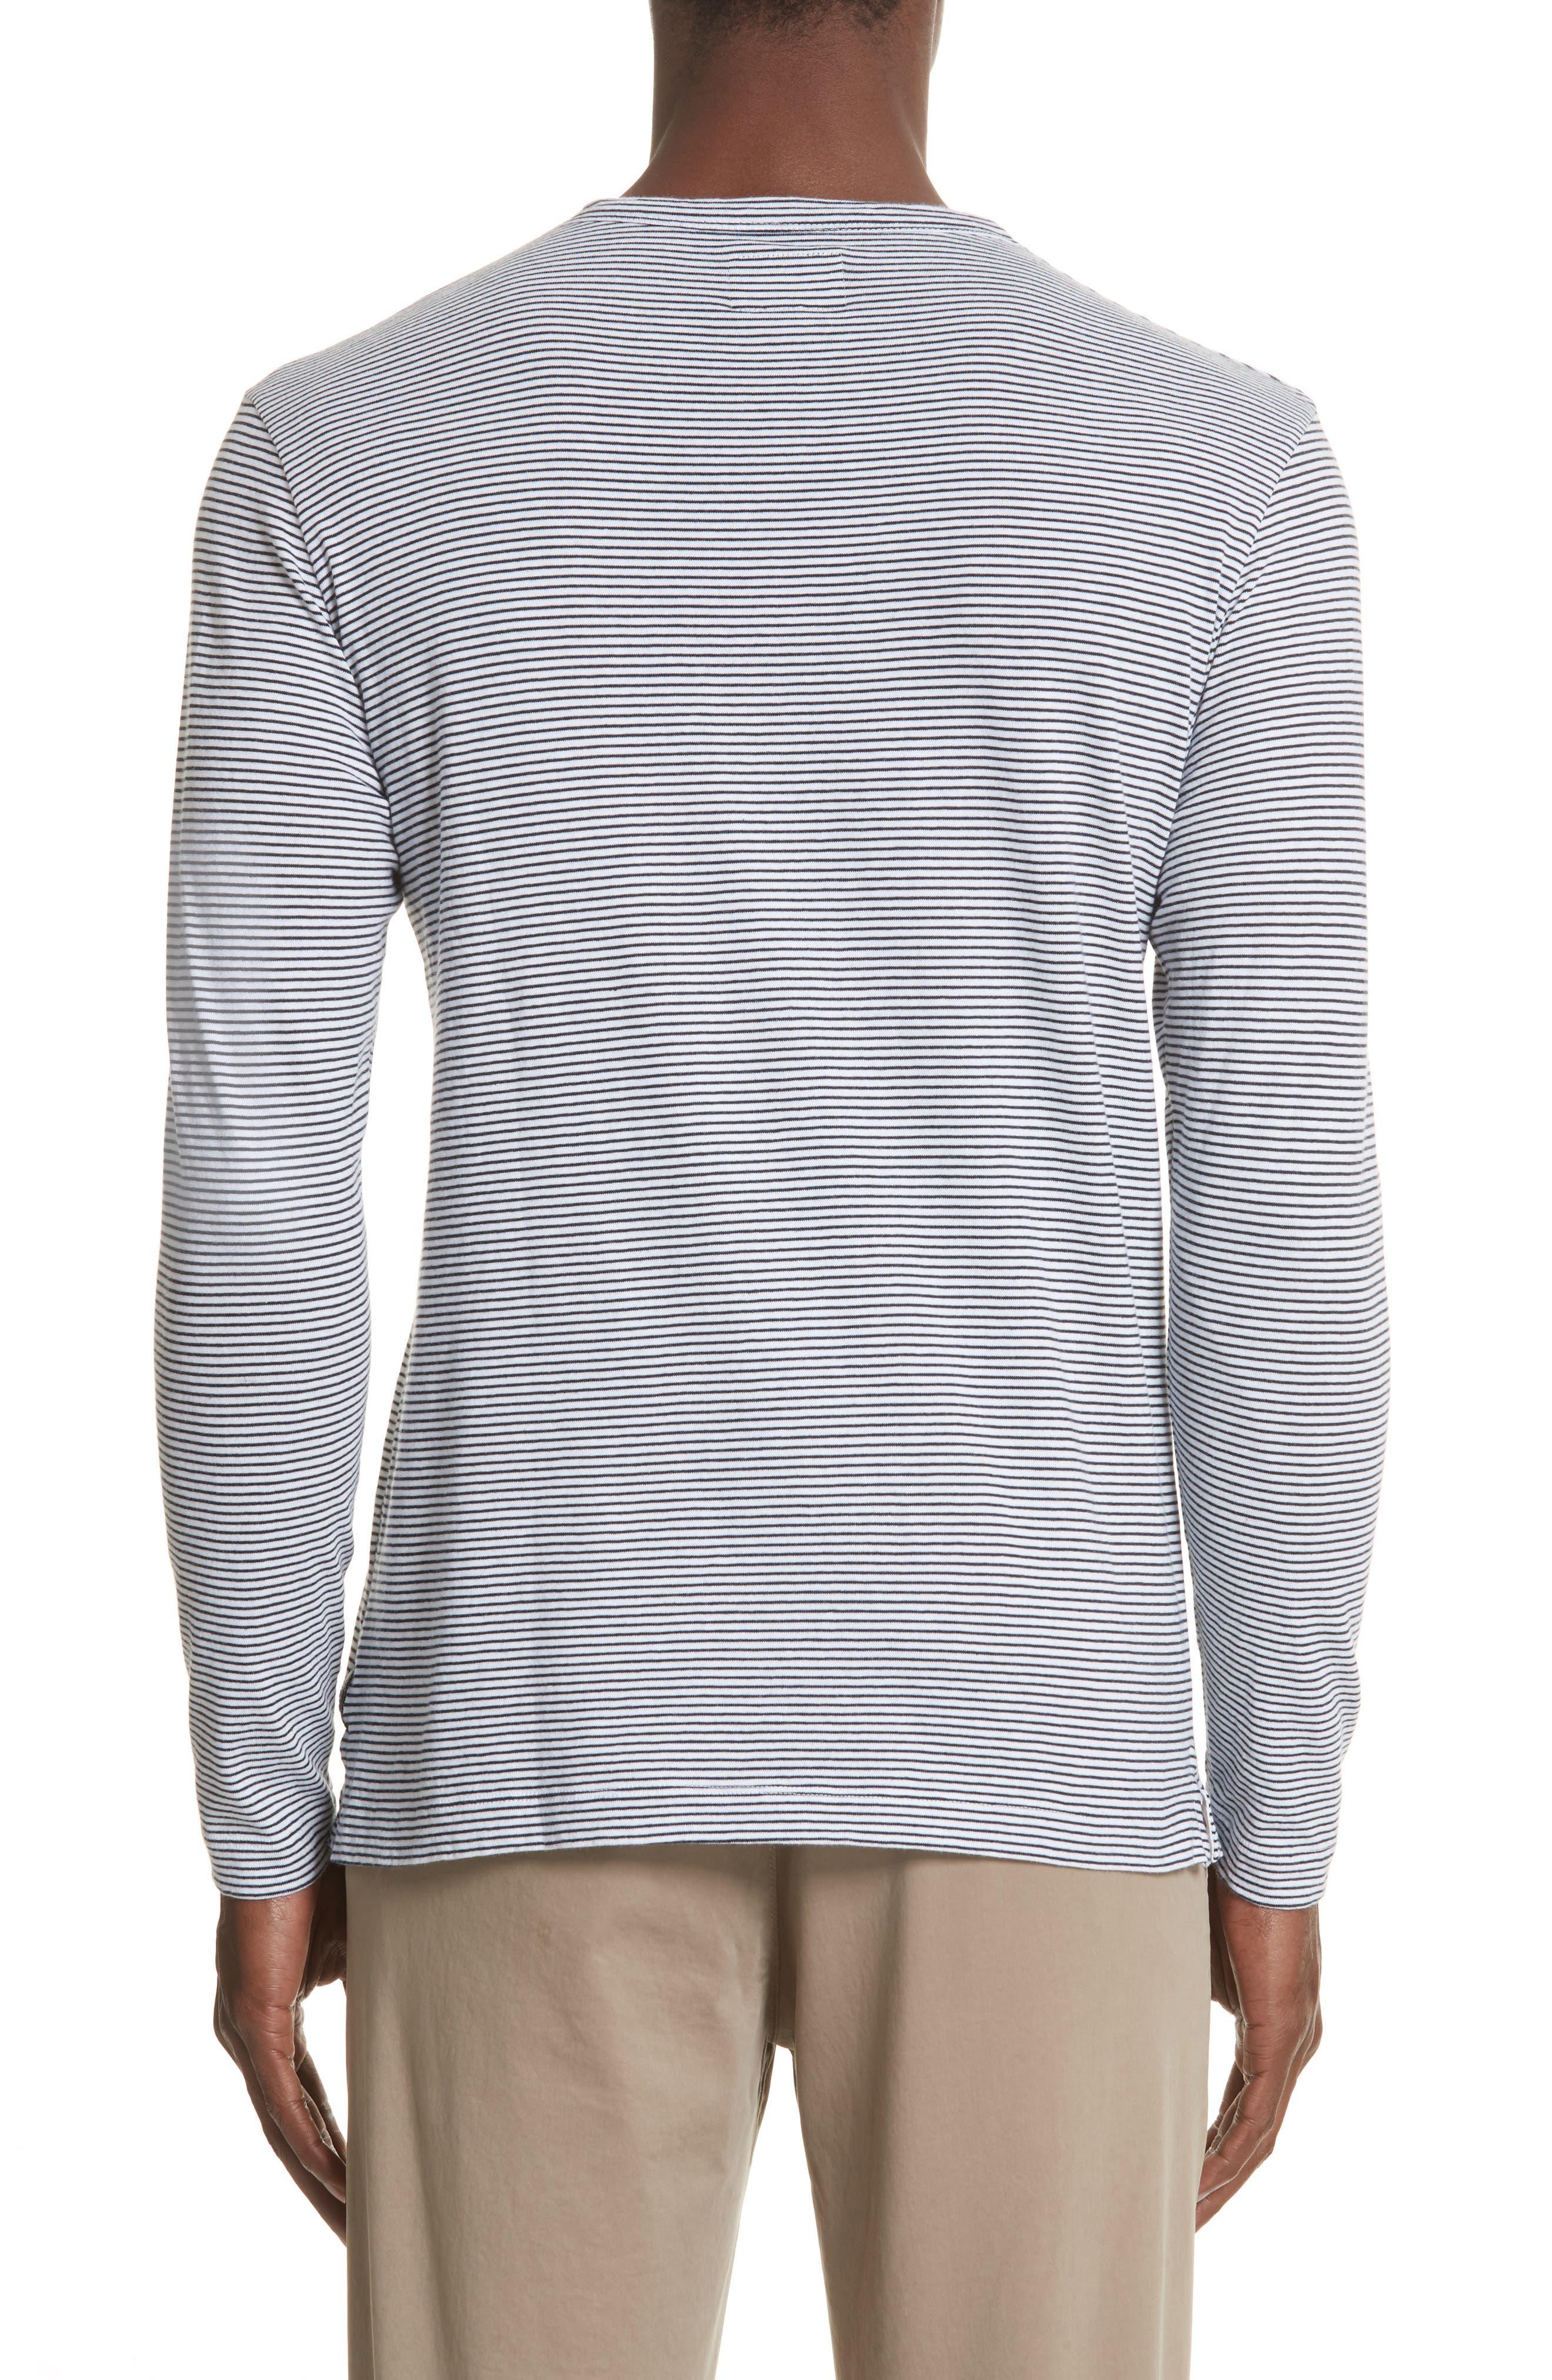 Todd Snyder Stripe Long Sleeve T-Shirt,                             Alternate thumbnail 2, color,                             Navy